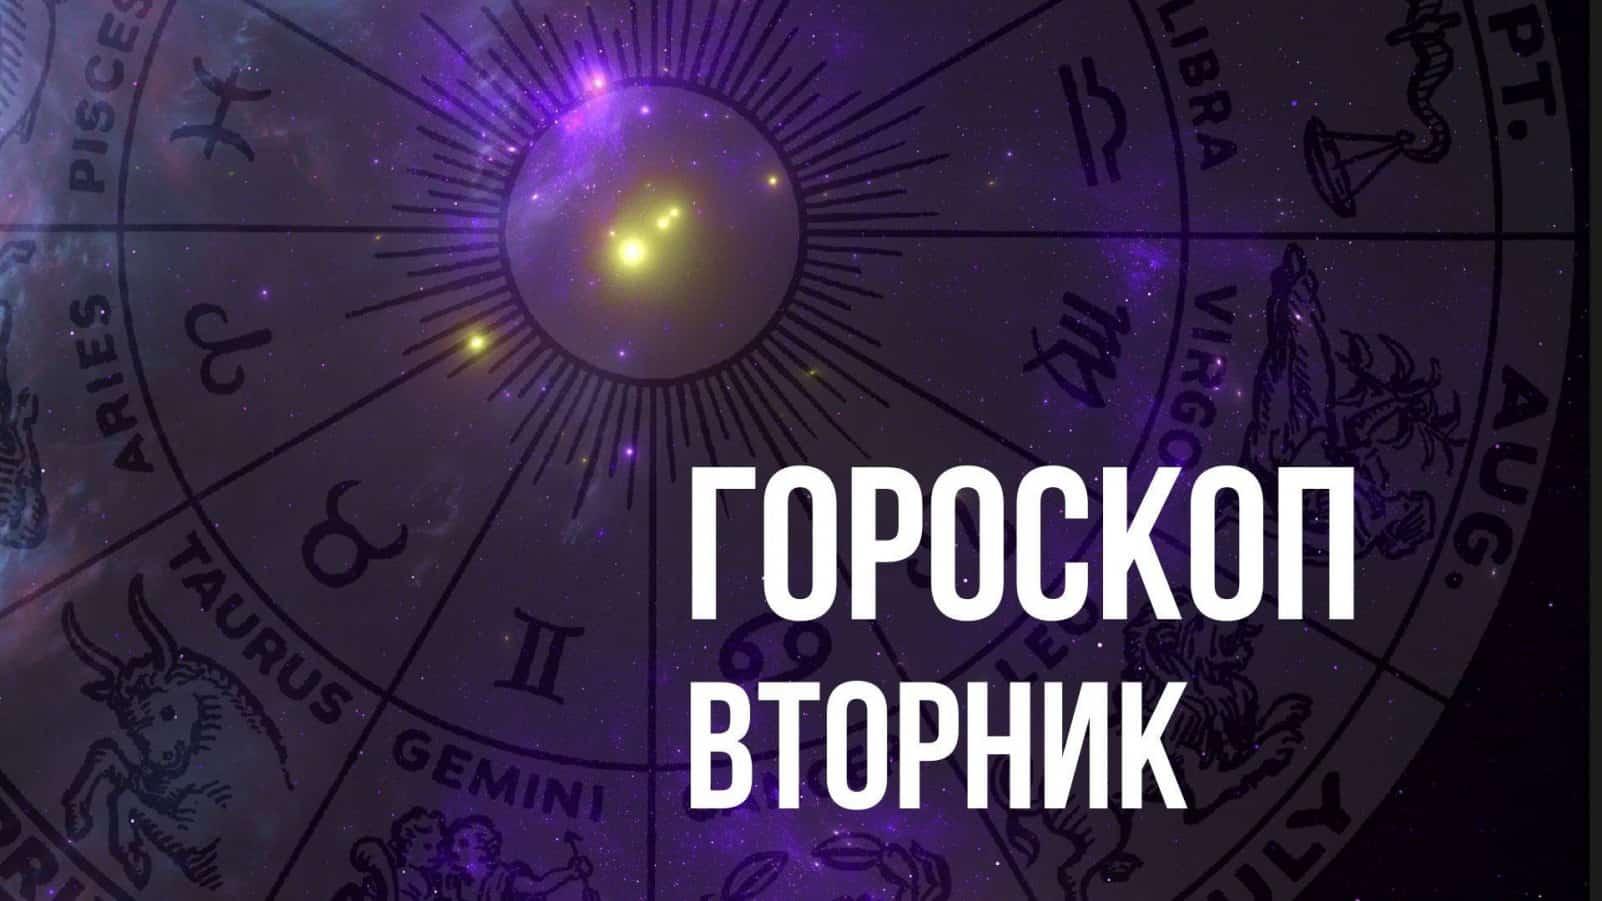 Гороскоп на вторник 21 сентября для каждого знака Зодиака